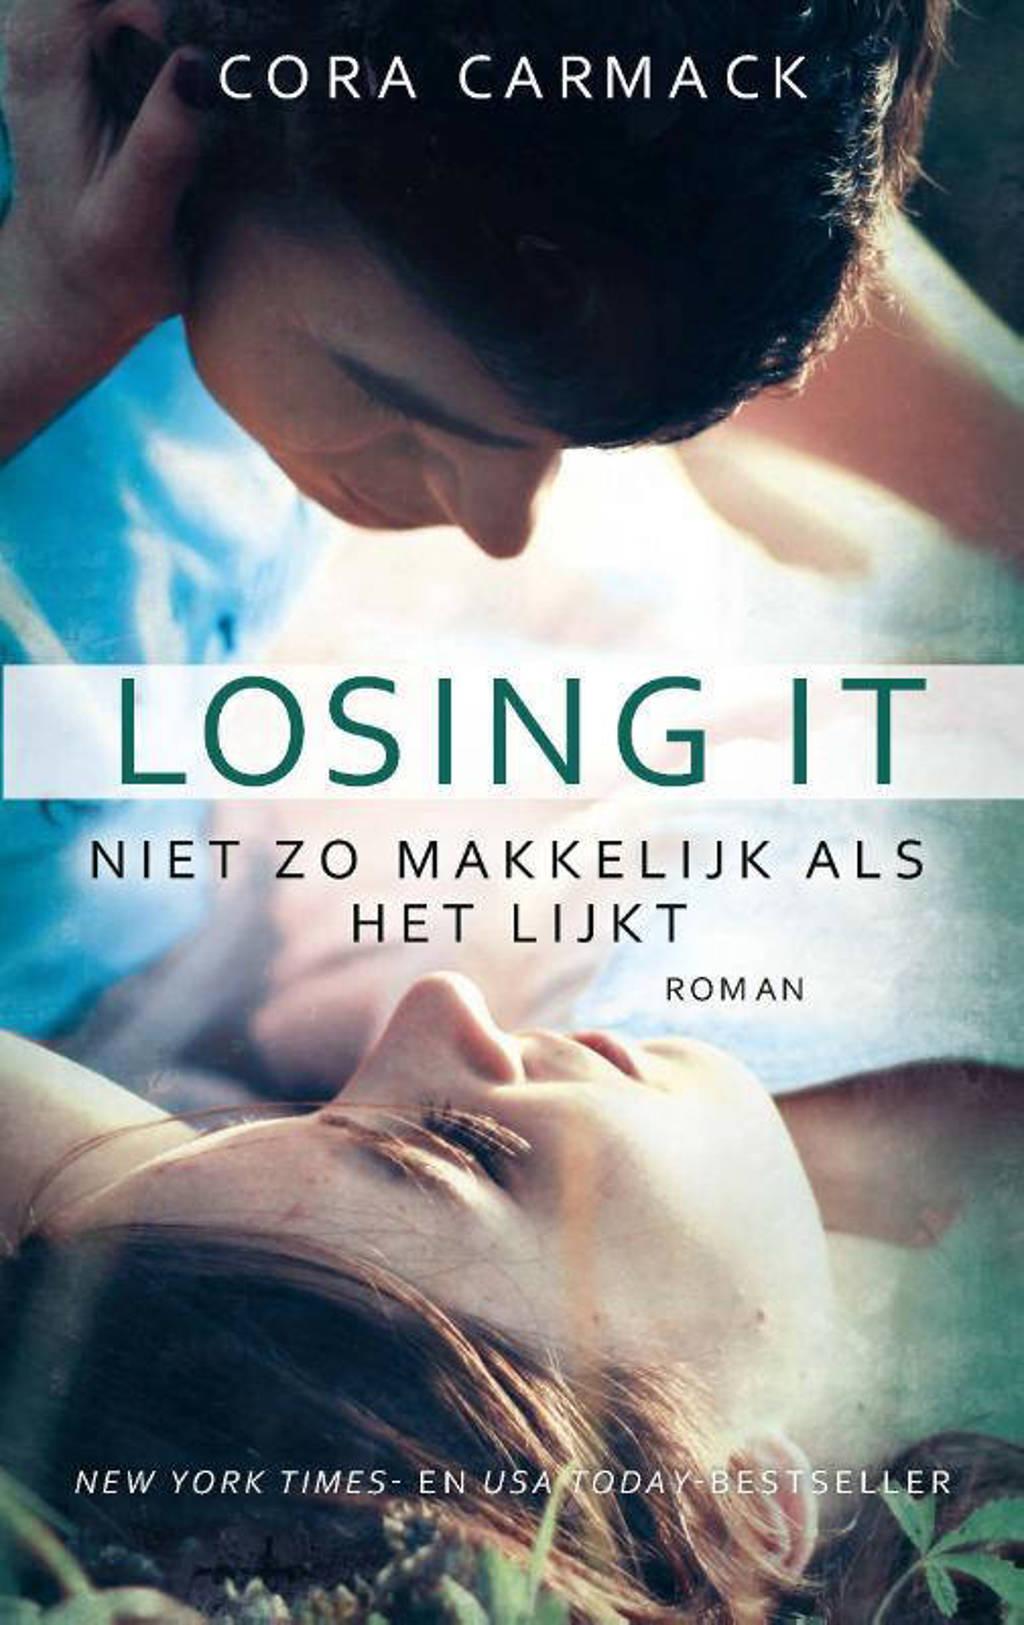 Losing it - Cora Carmack